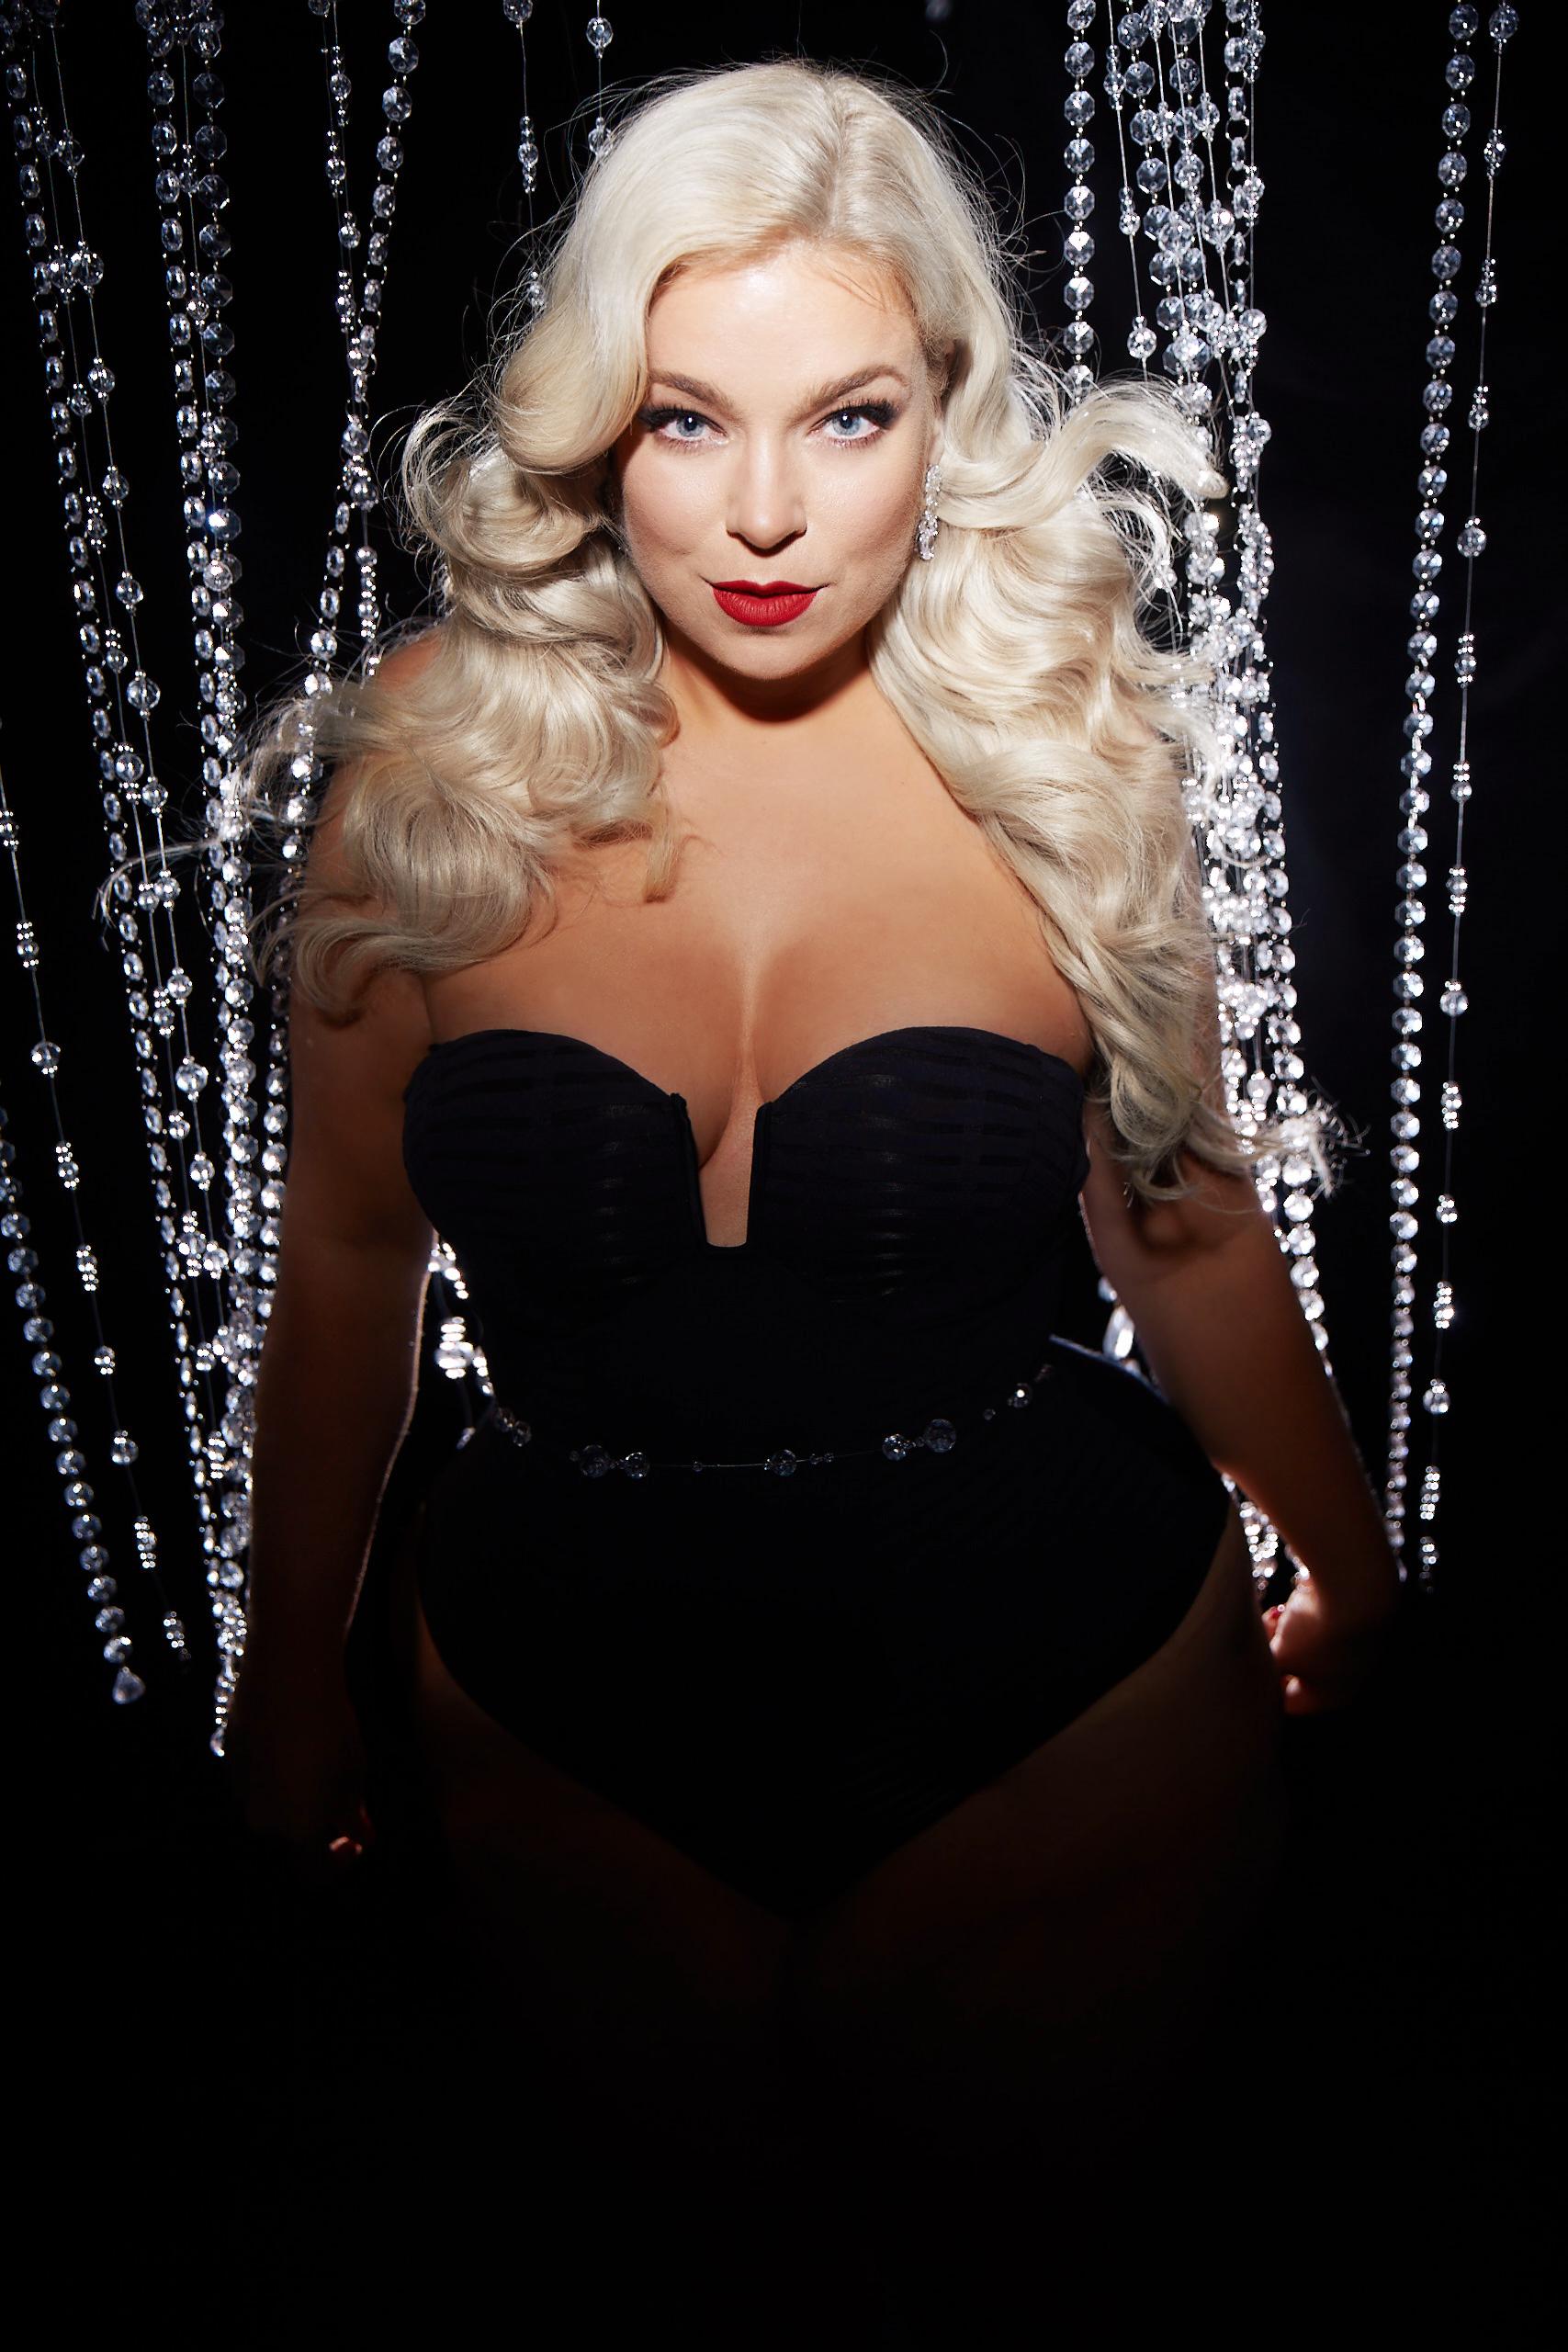 Caterina-pogorzelski-Megabambi-Glamour-Curvy-Model-Plussize-Blogger